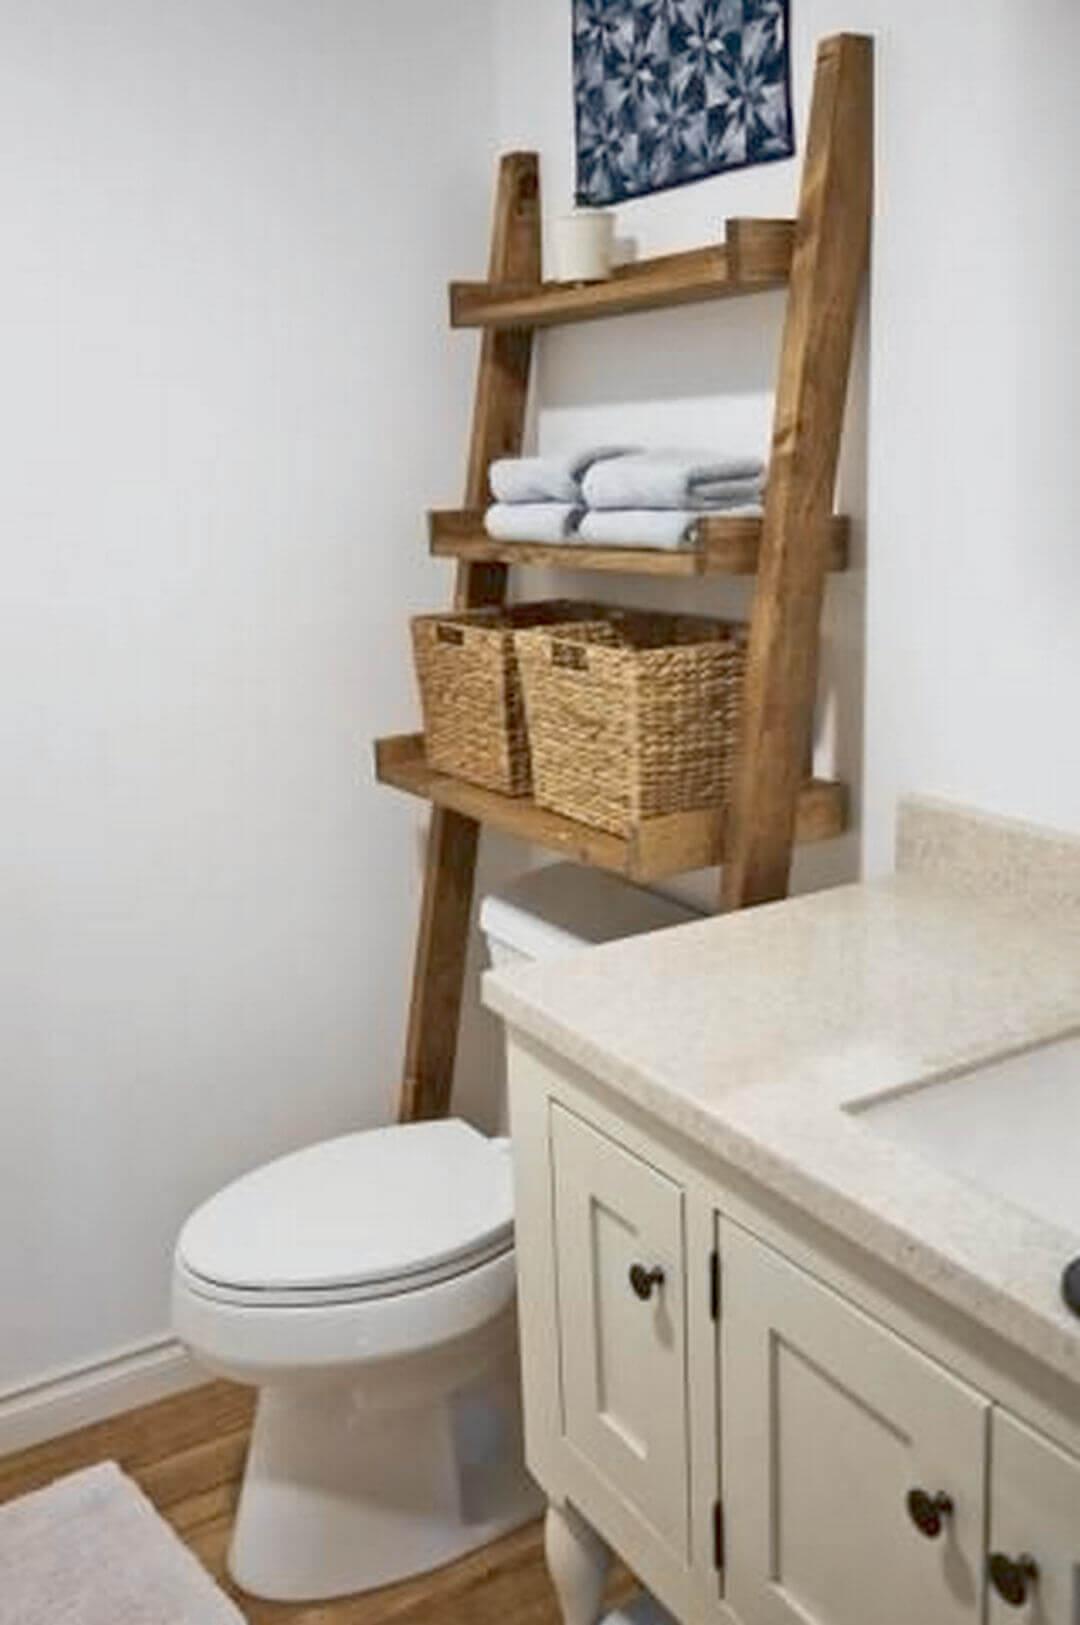 Bathroom Storage Ideas Ladder Organizer on the Toilet - Harptimes.com